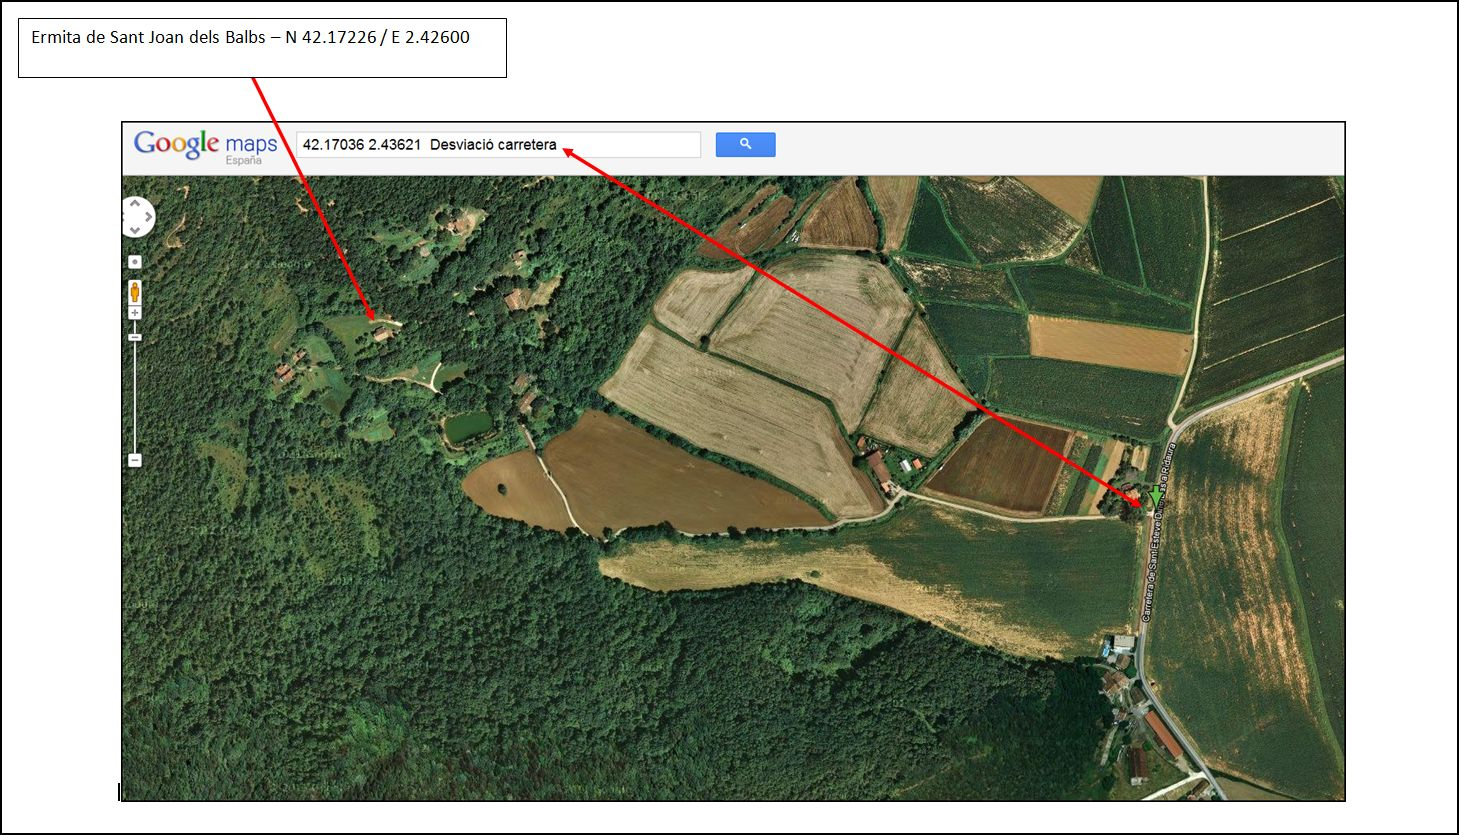 ermita-de-st-joan-dels-balbs-110908-mapa-google-itinerari